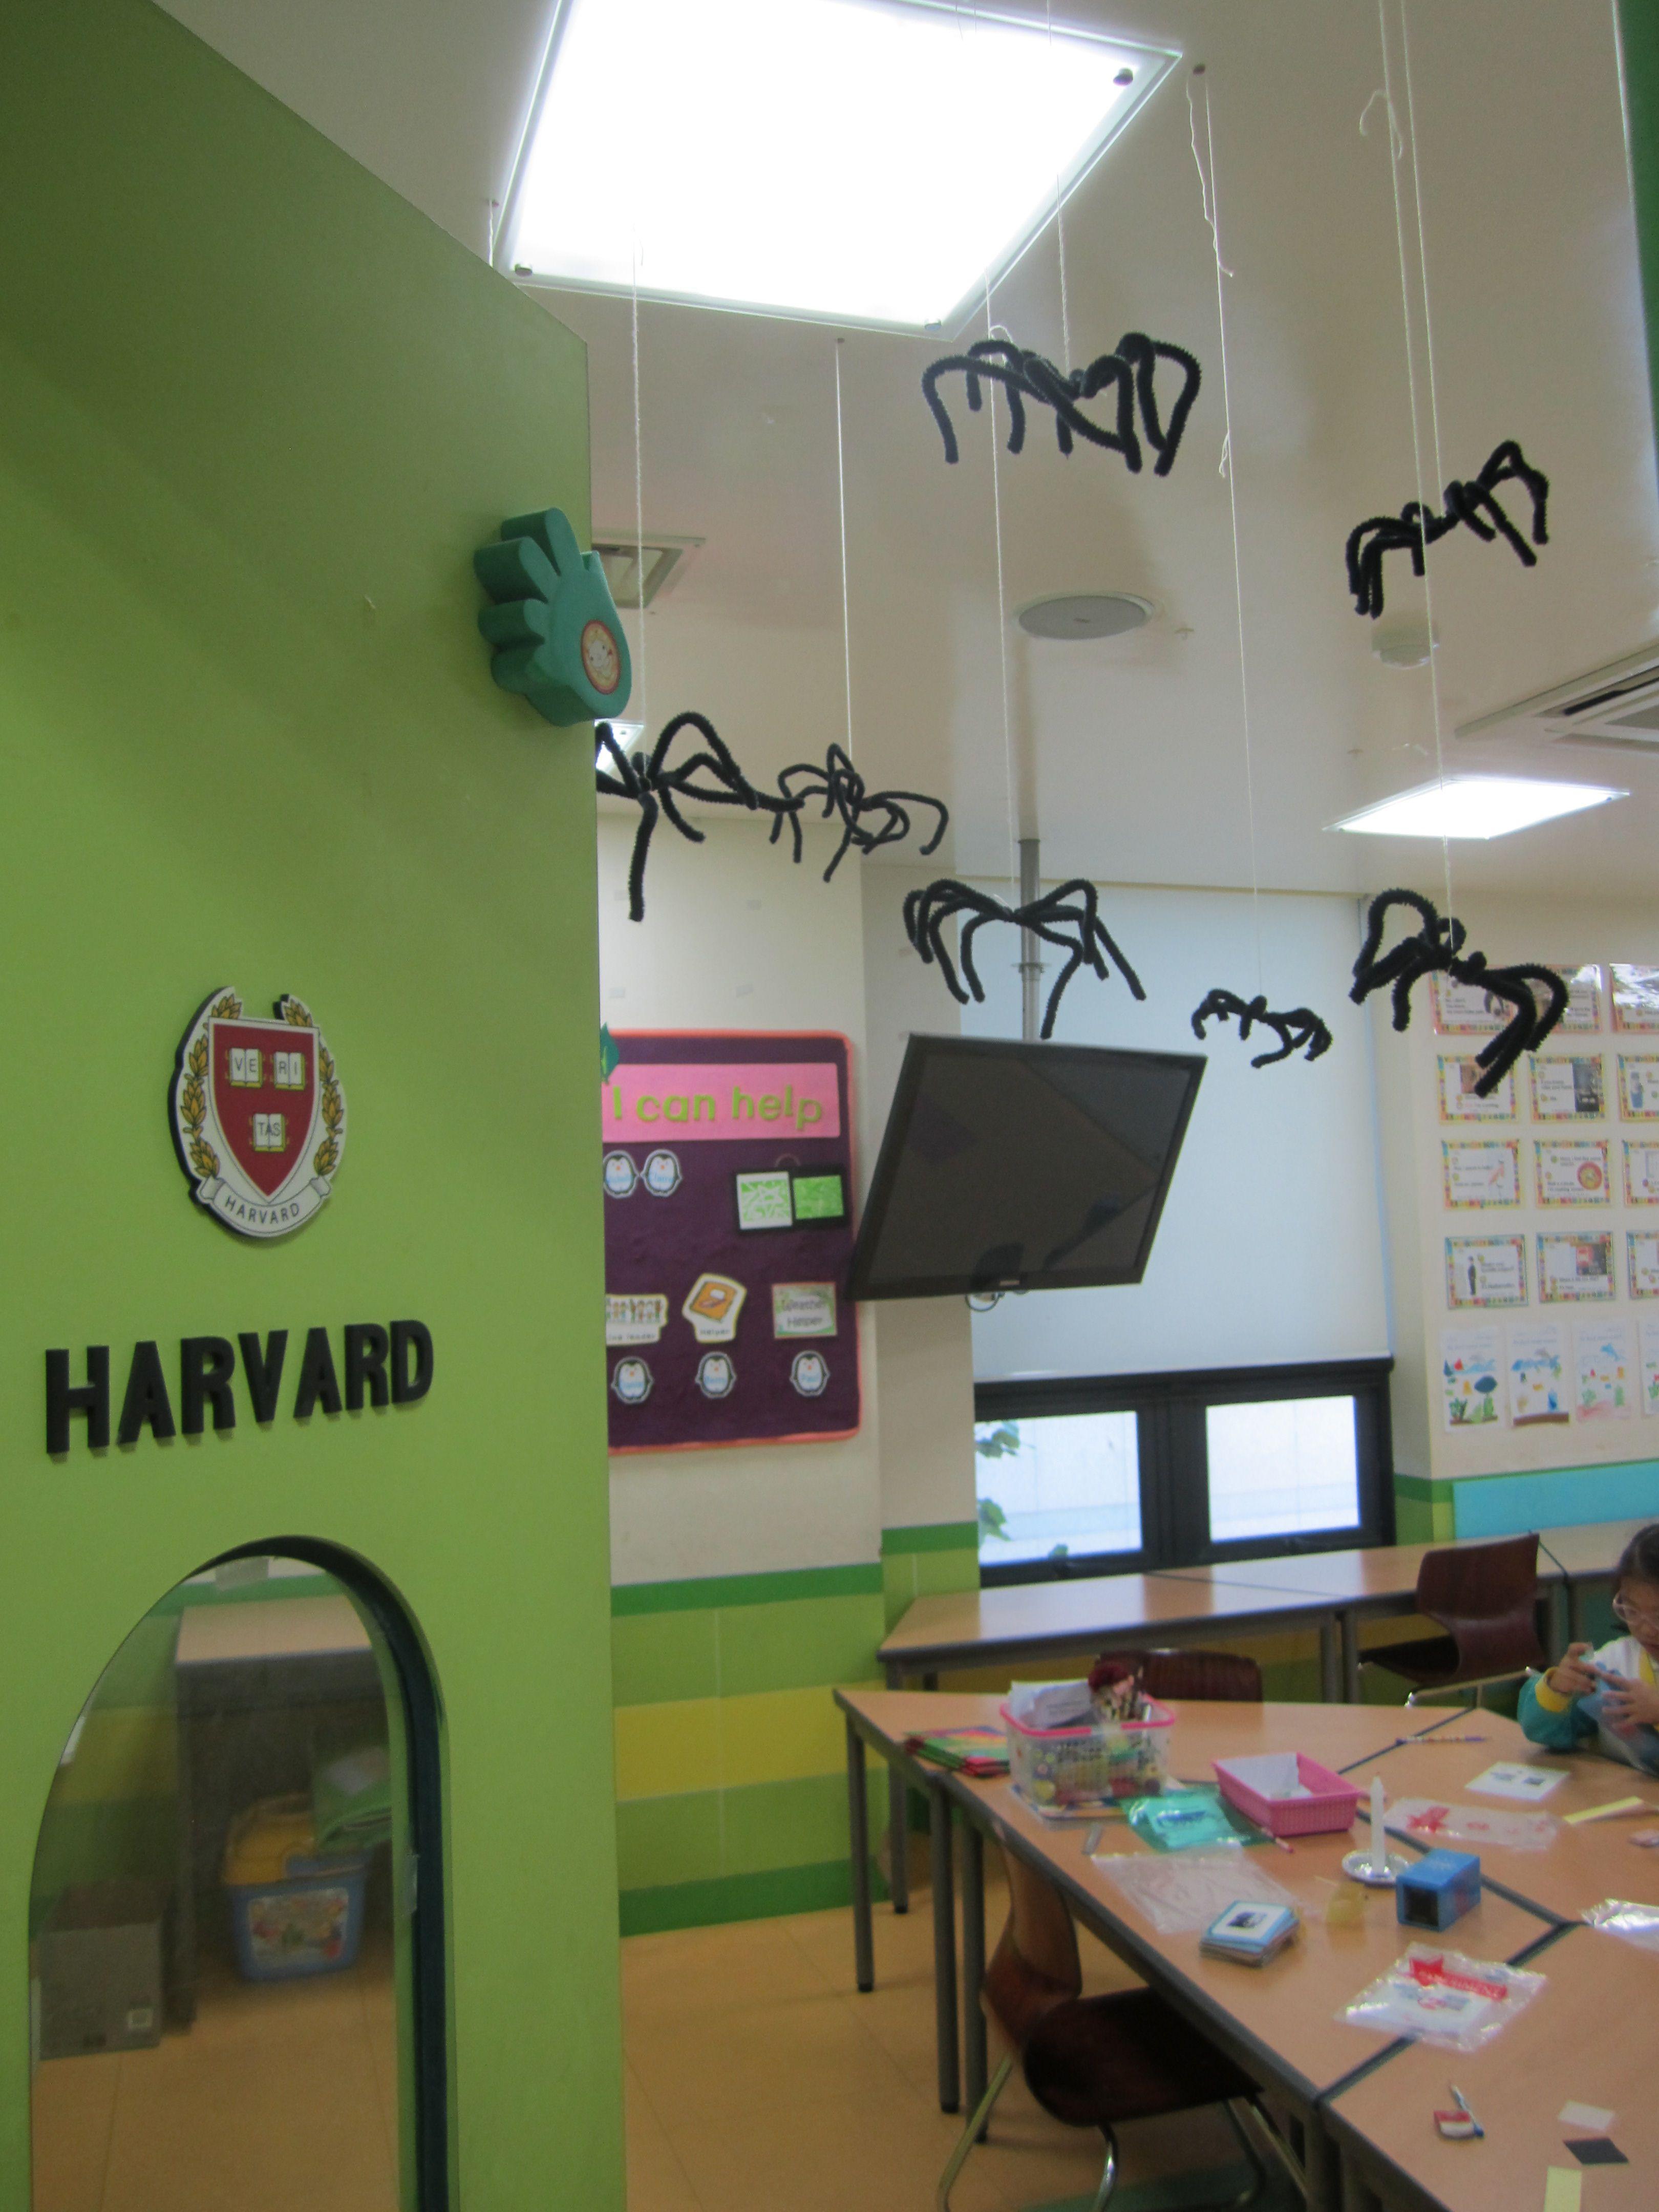 Halloween classroom decorations - Hanging Spiders Halloween Classroom Decoration